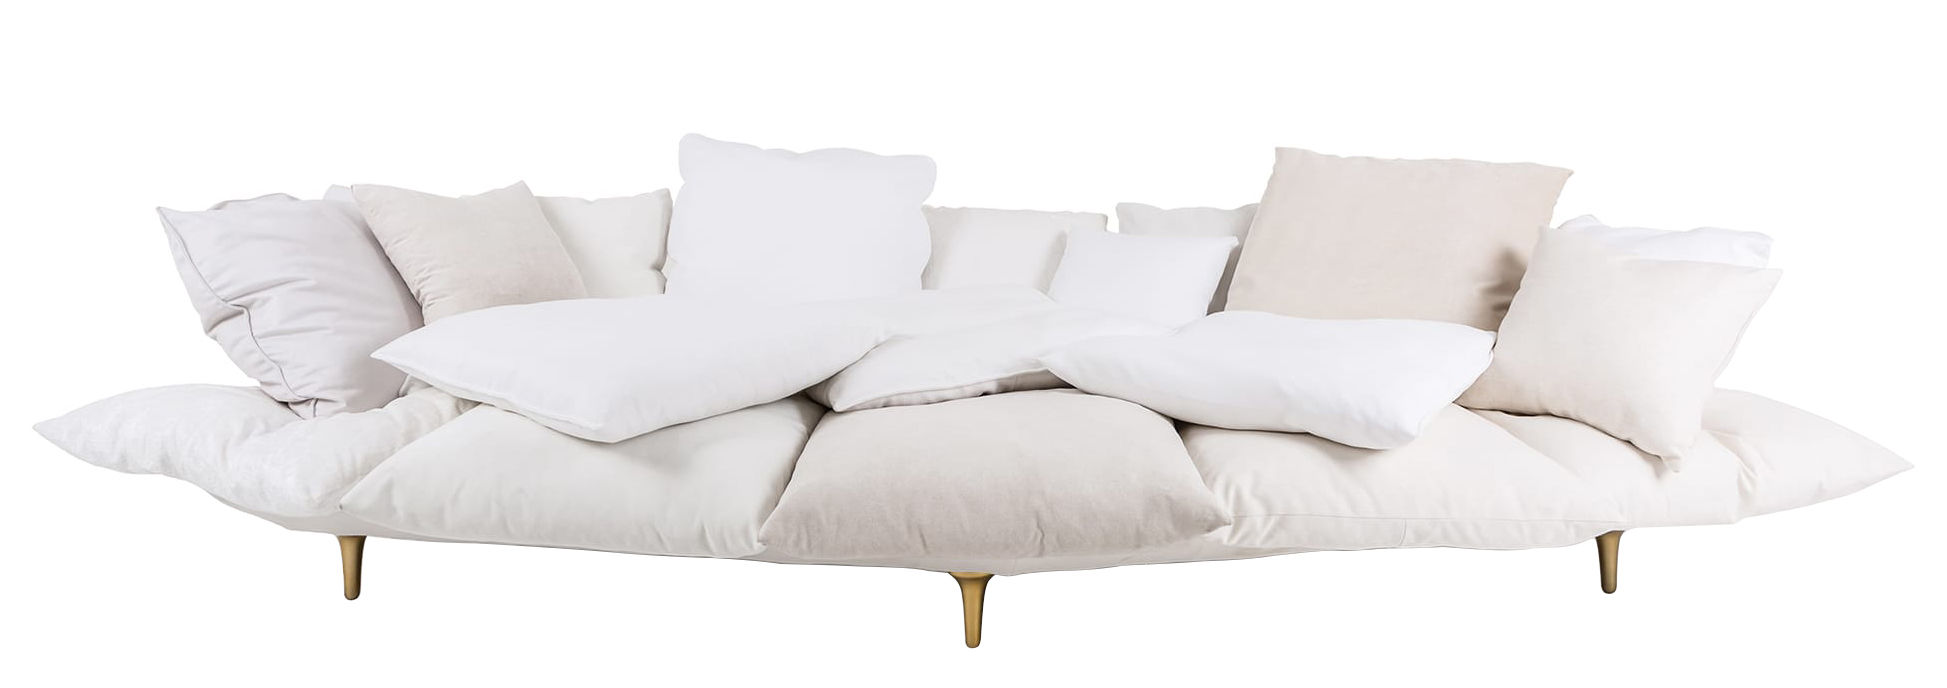 Möbel - Sofas - Comfy Sofa / L 300 cm - Seletti - Weiß - Gewebe, Holz, lackiertes Metall, Polyurethan-Schaum